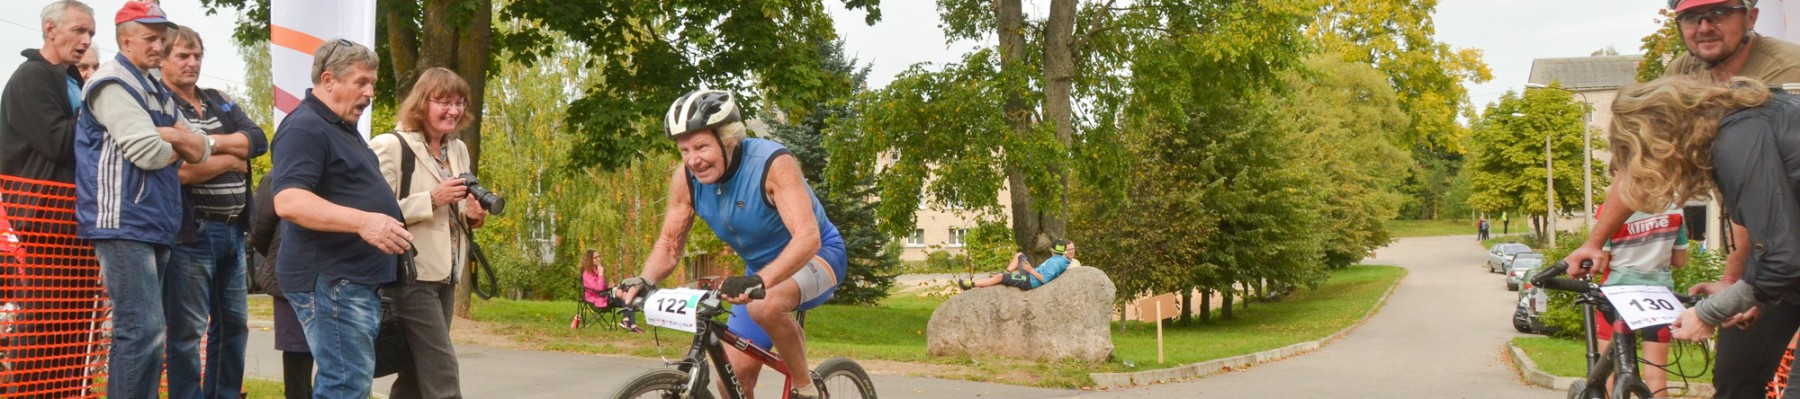 Daugavpils novada MTB maratons 2018